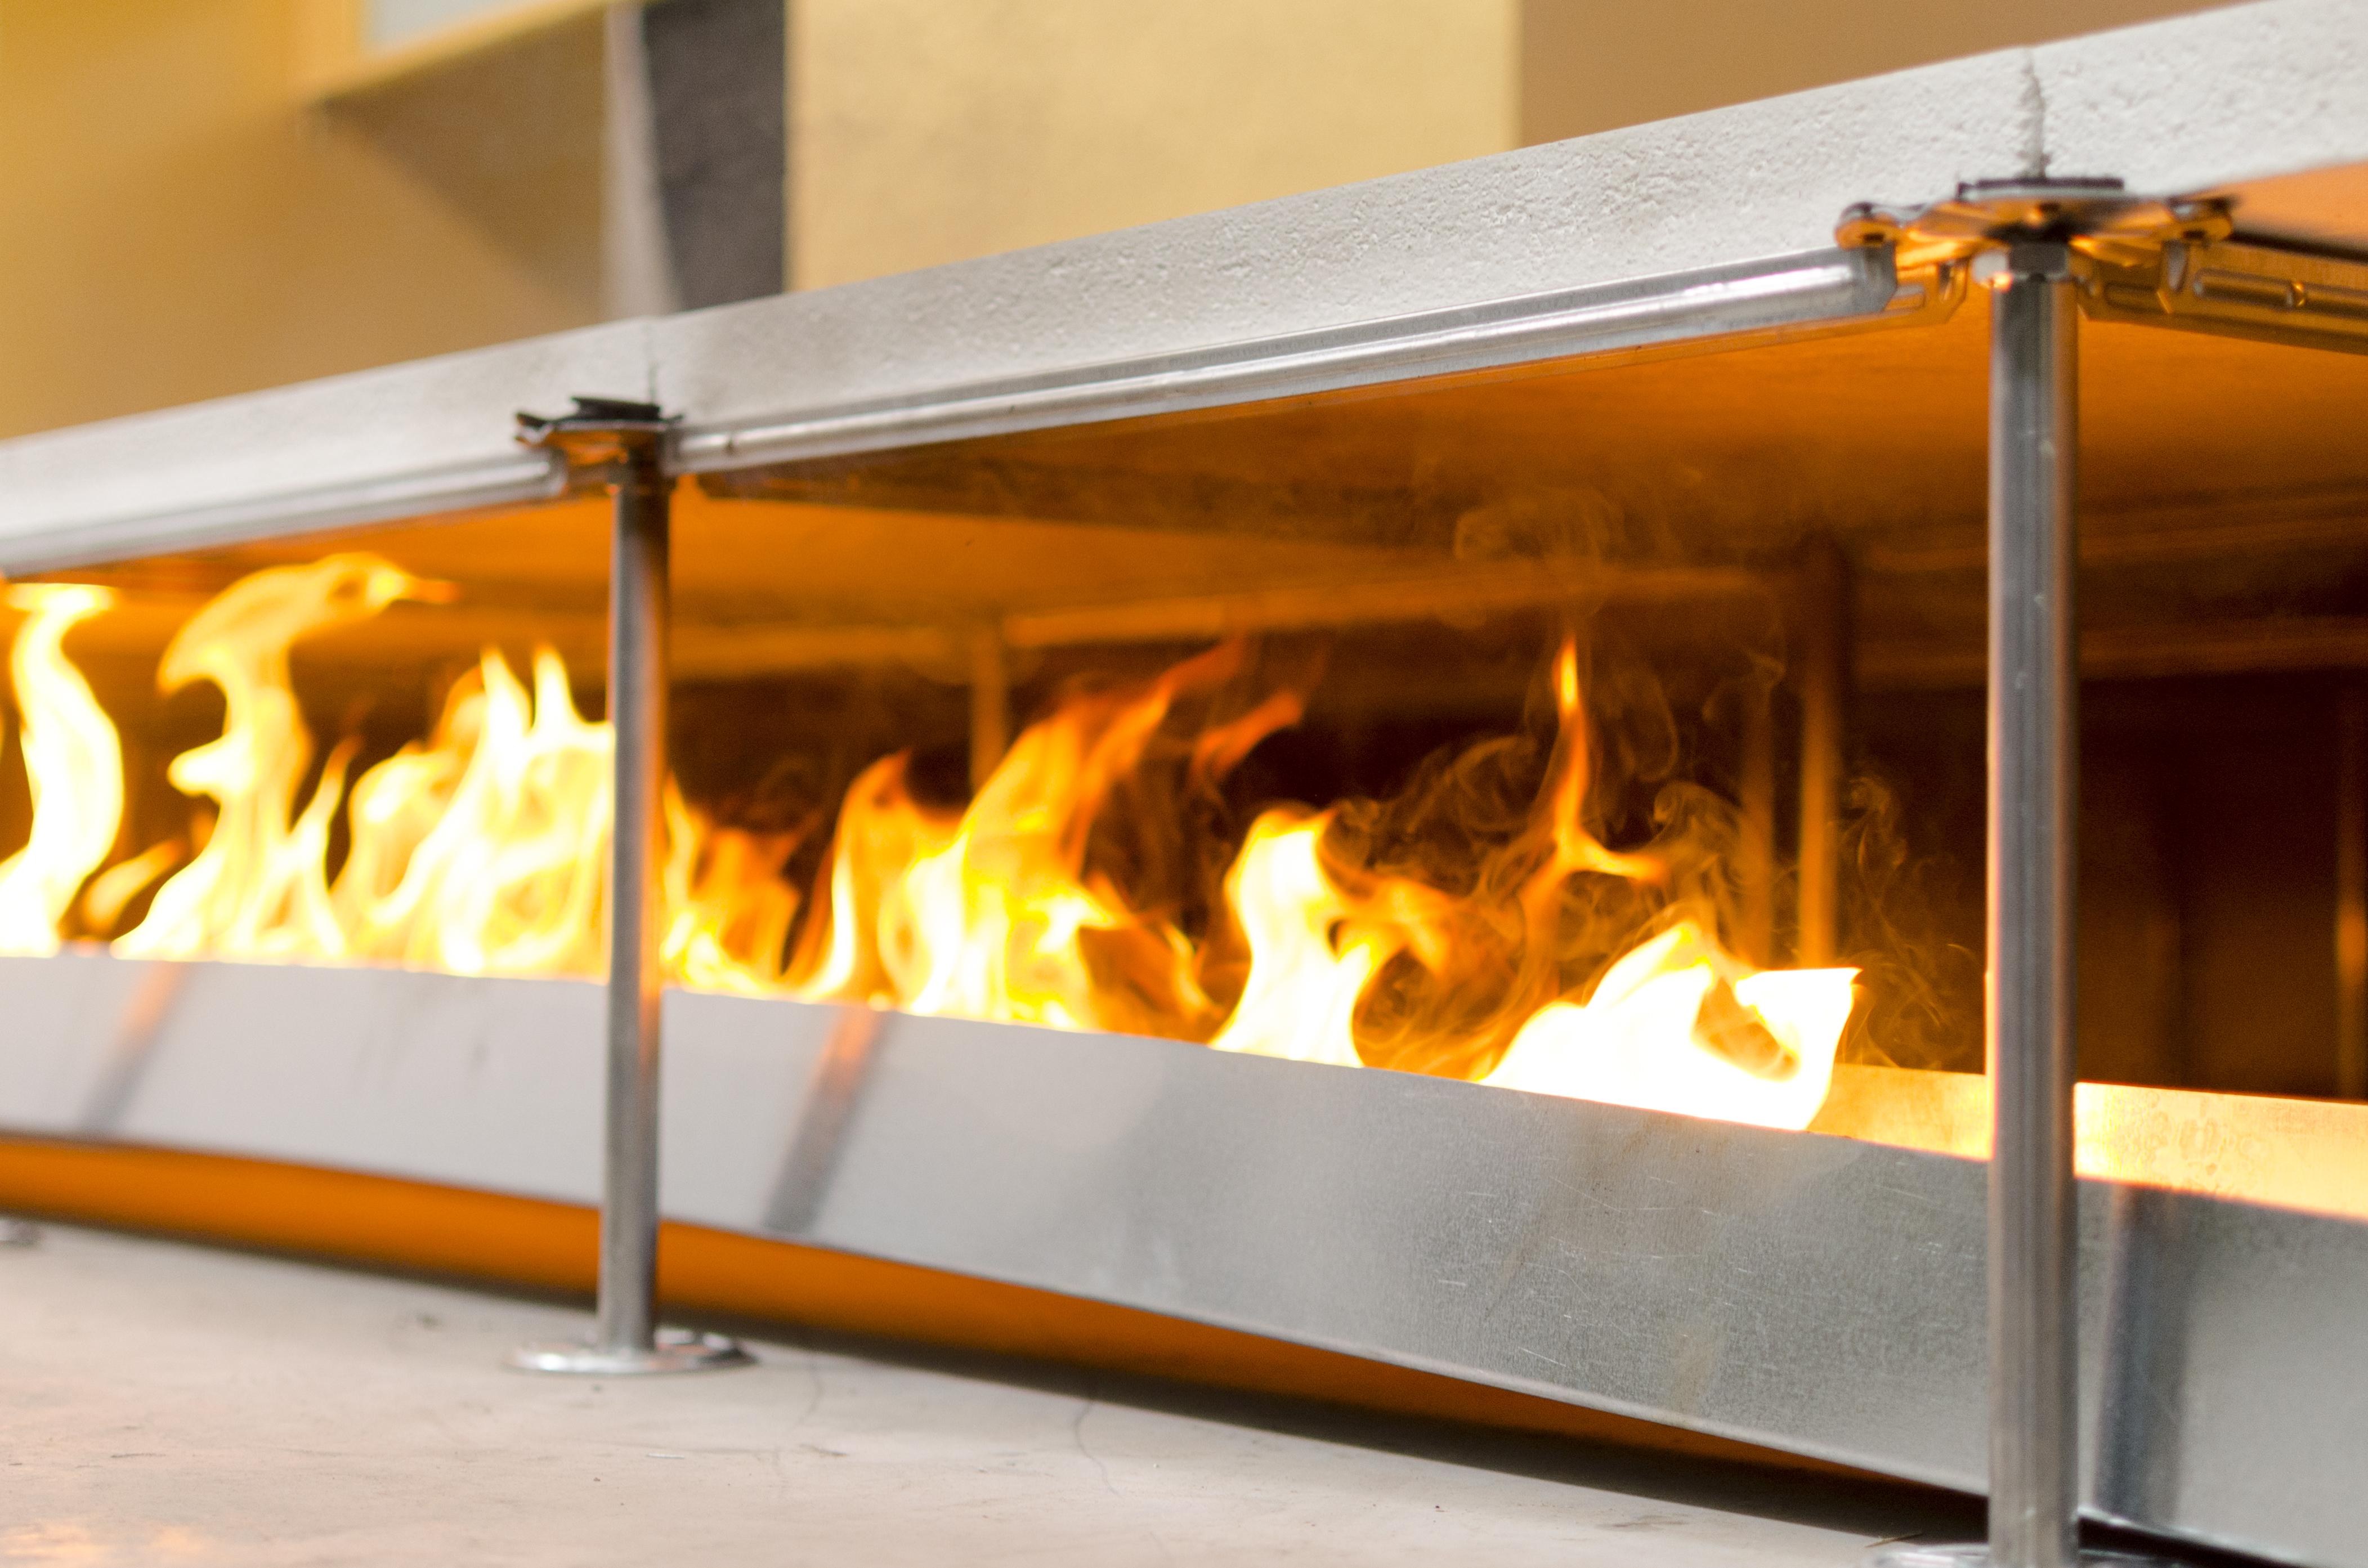 Quattro Pavimente - pardoseli suprainlatate rezistente la foc